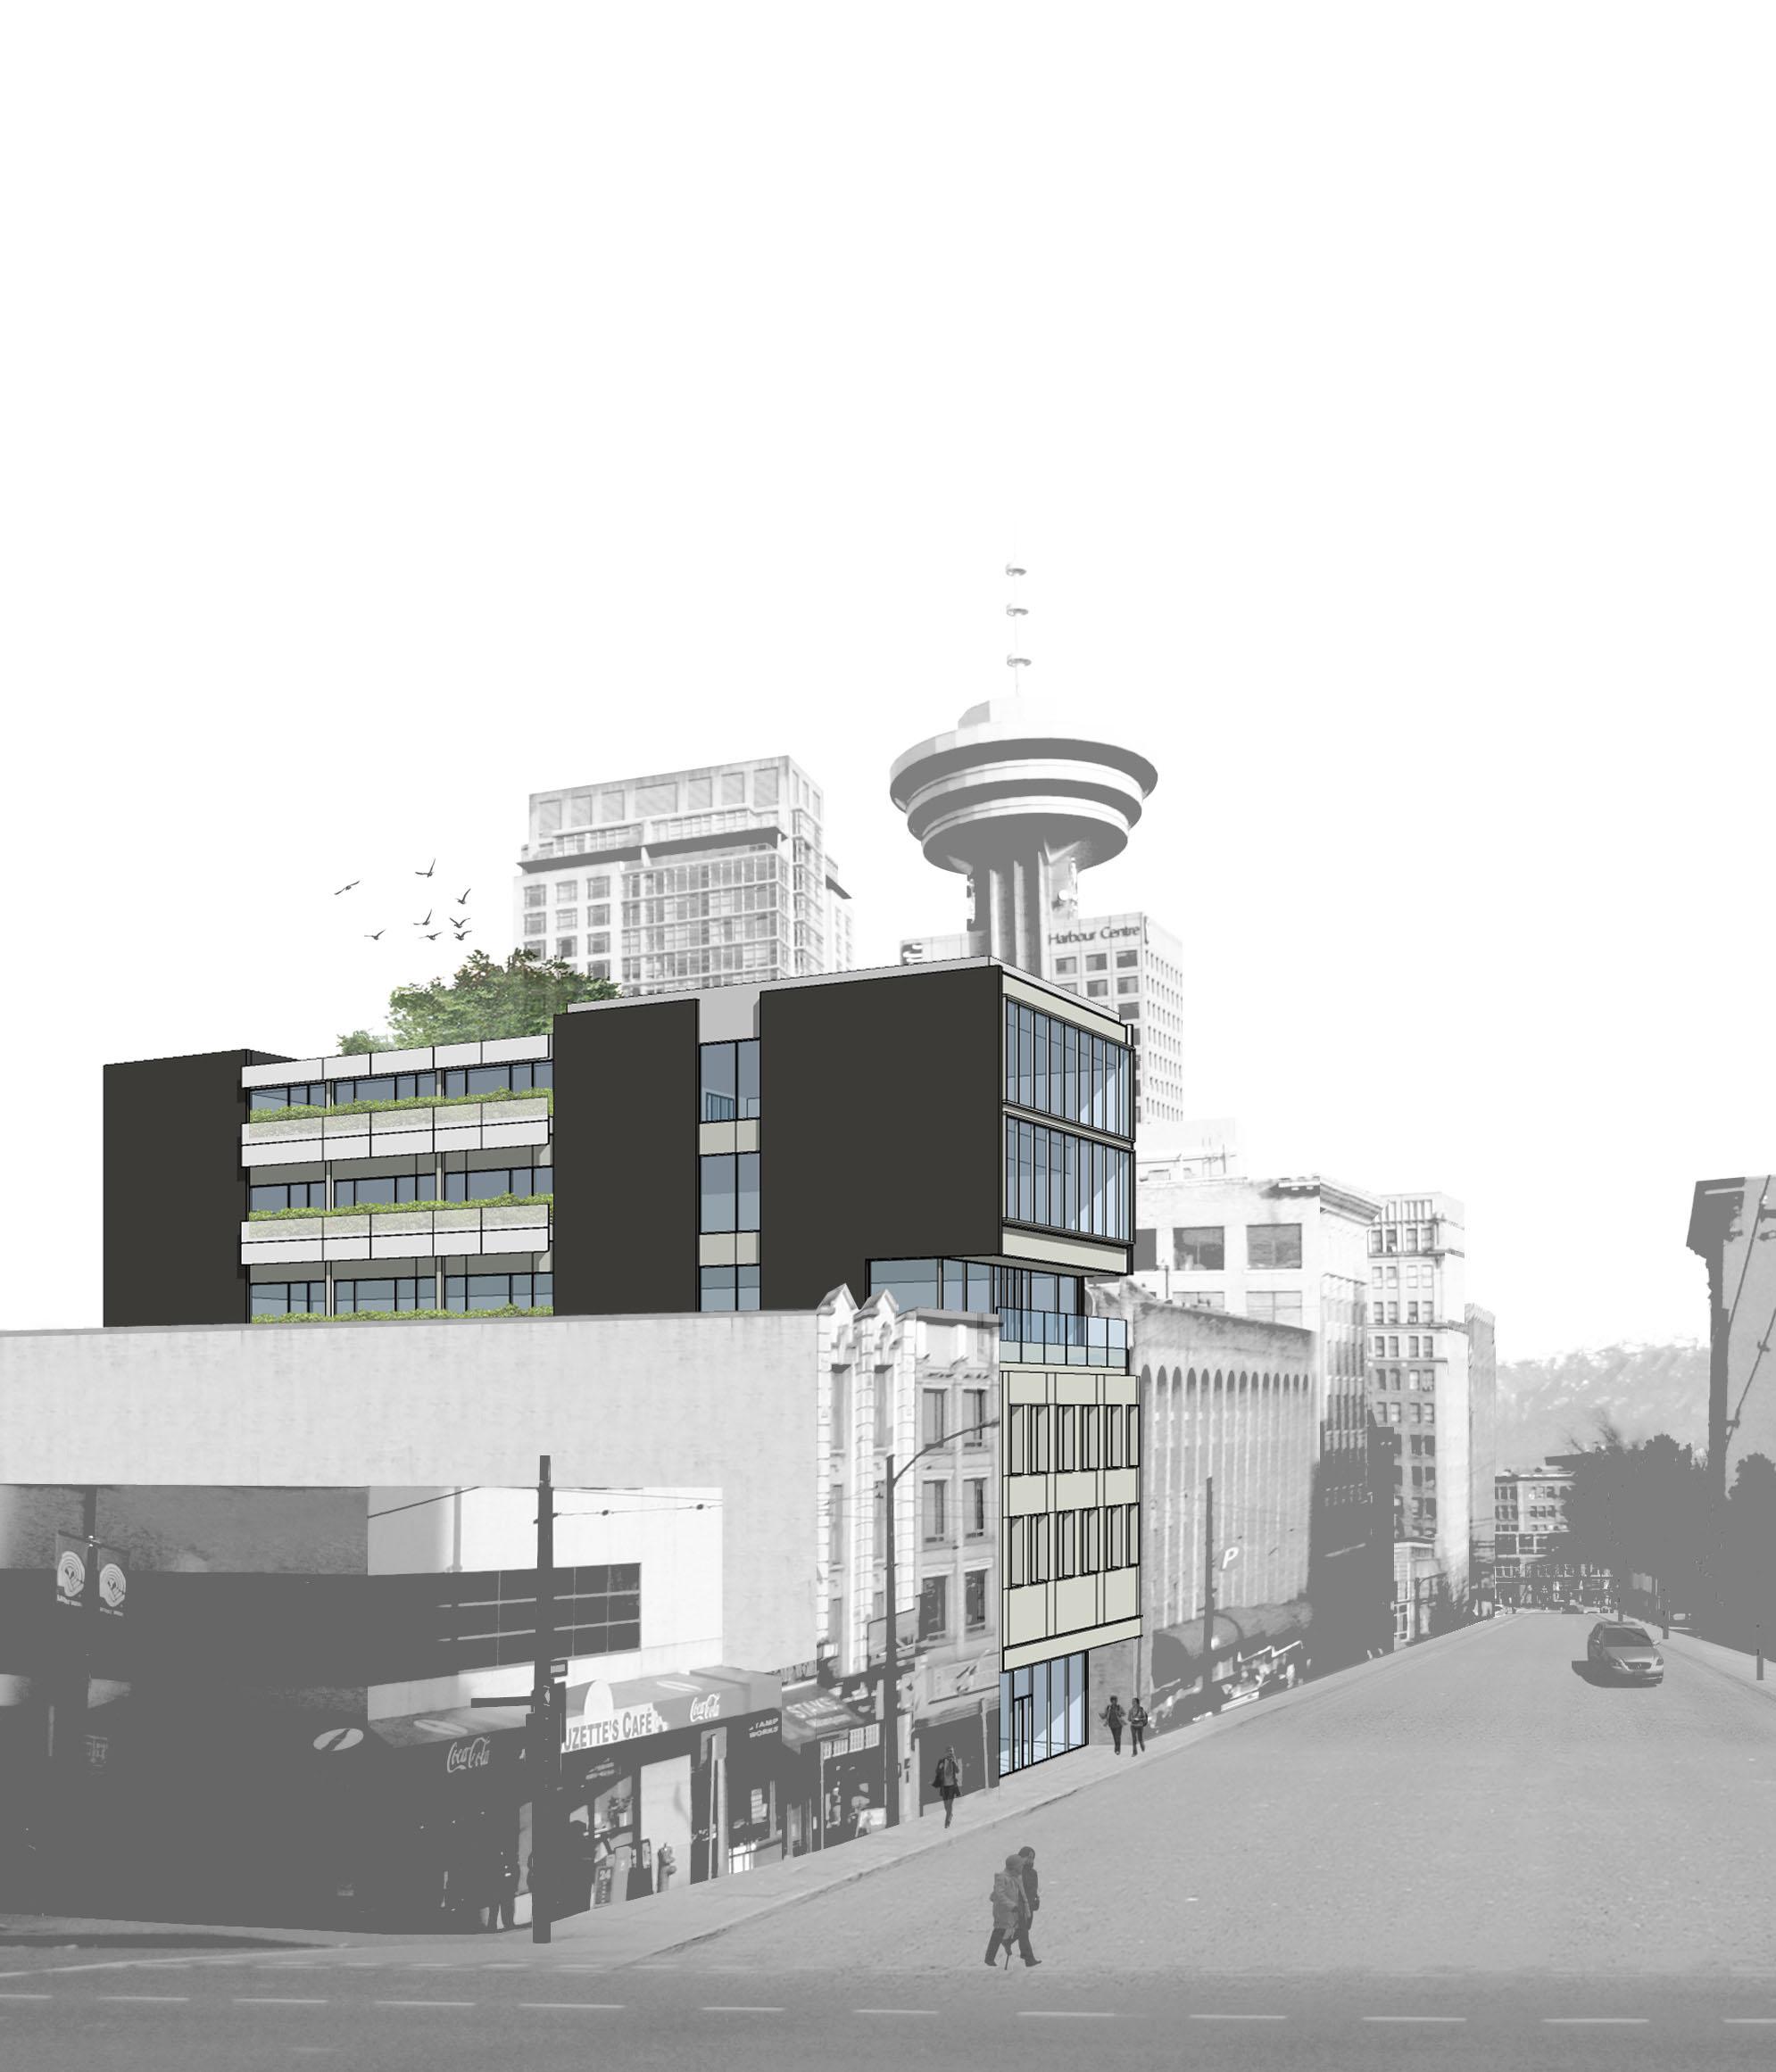 ILSC_Street Perspective_FINAL_WEB.jpg